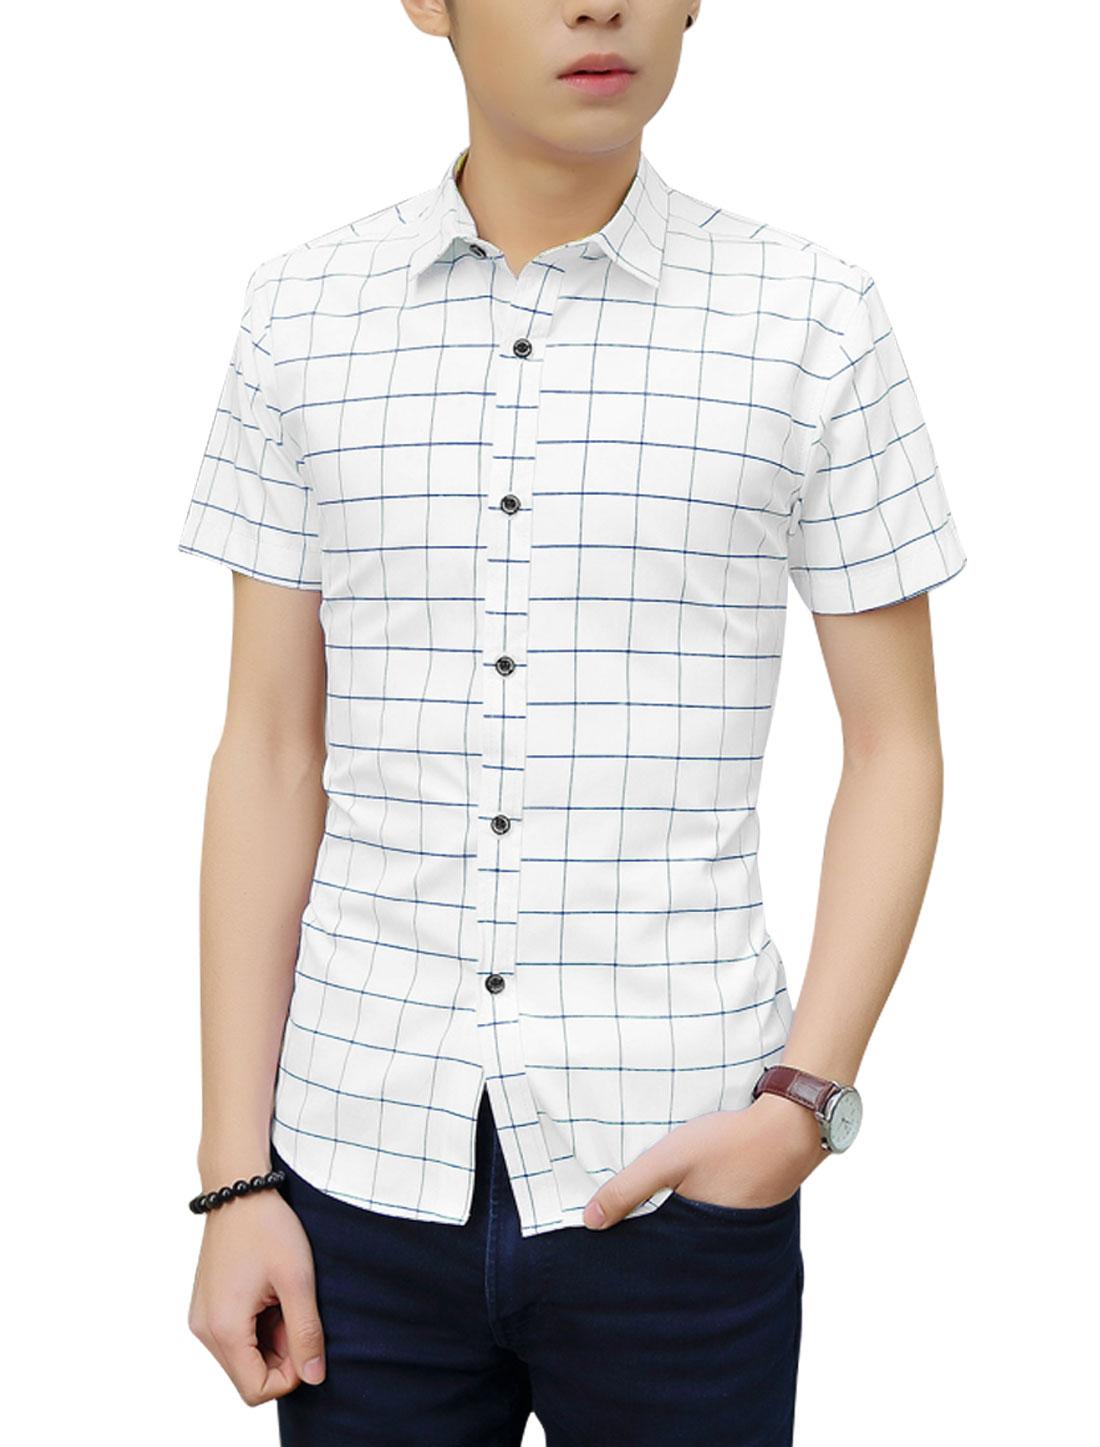 Men Point Collar Checkered Pattern Shirt Navy Blue White M